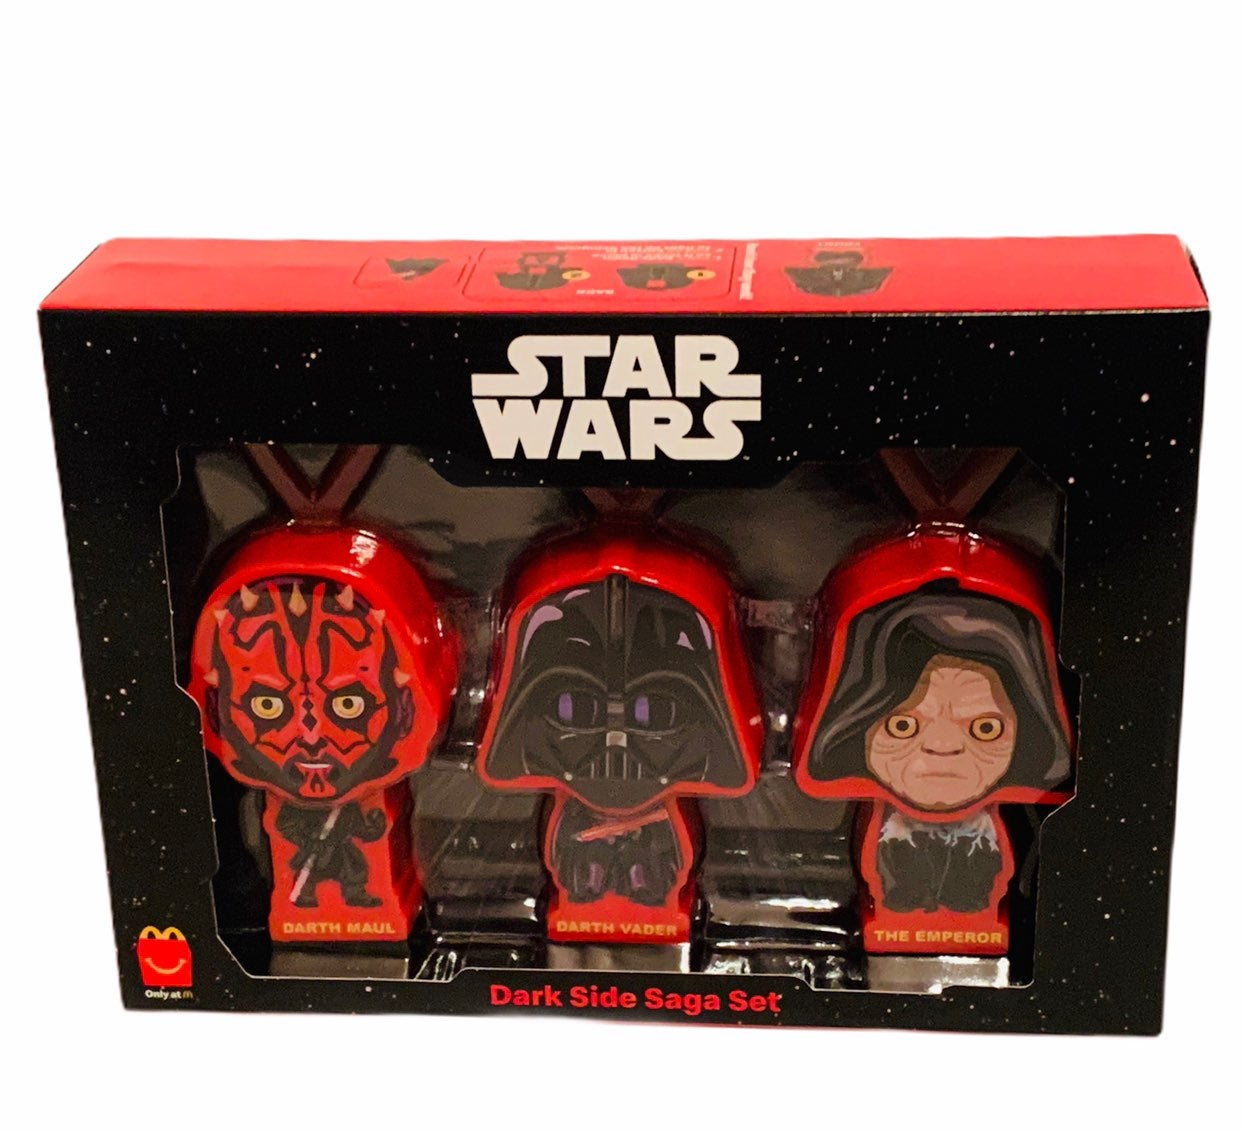 Star Wars figure Dark side sith Mcdonald